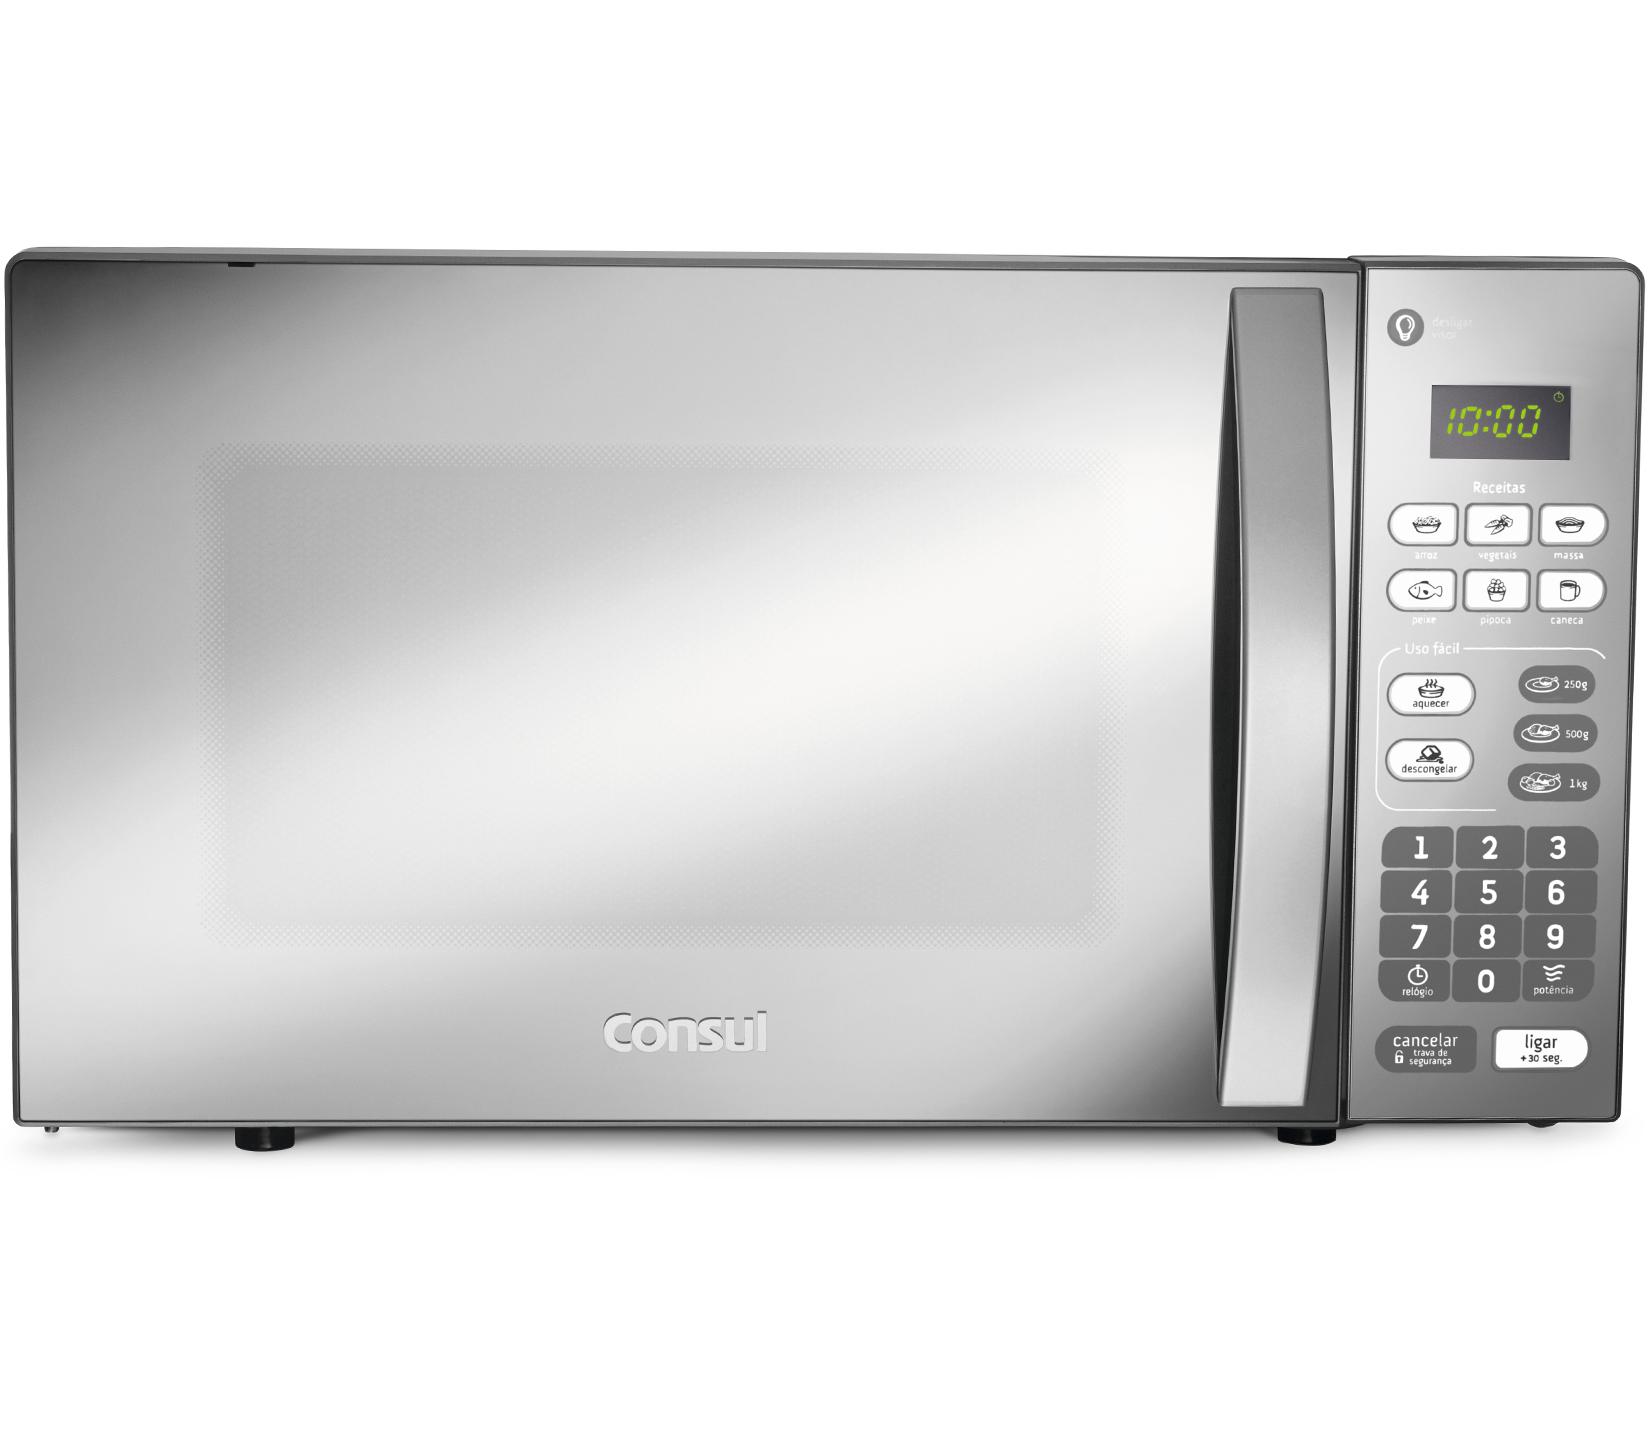 Micro-ondas Consul CM020BFANA Prata 127V - 20L Painel Touch